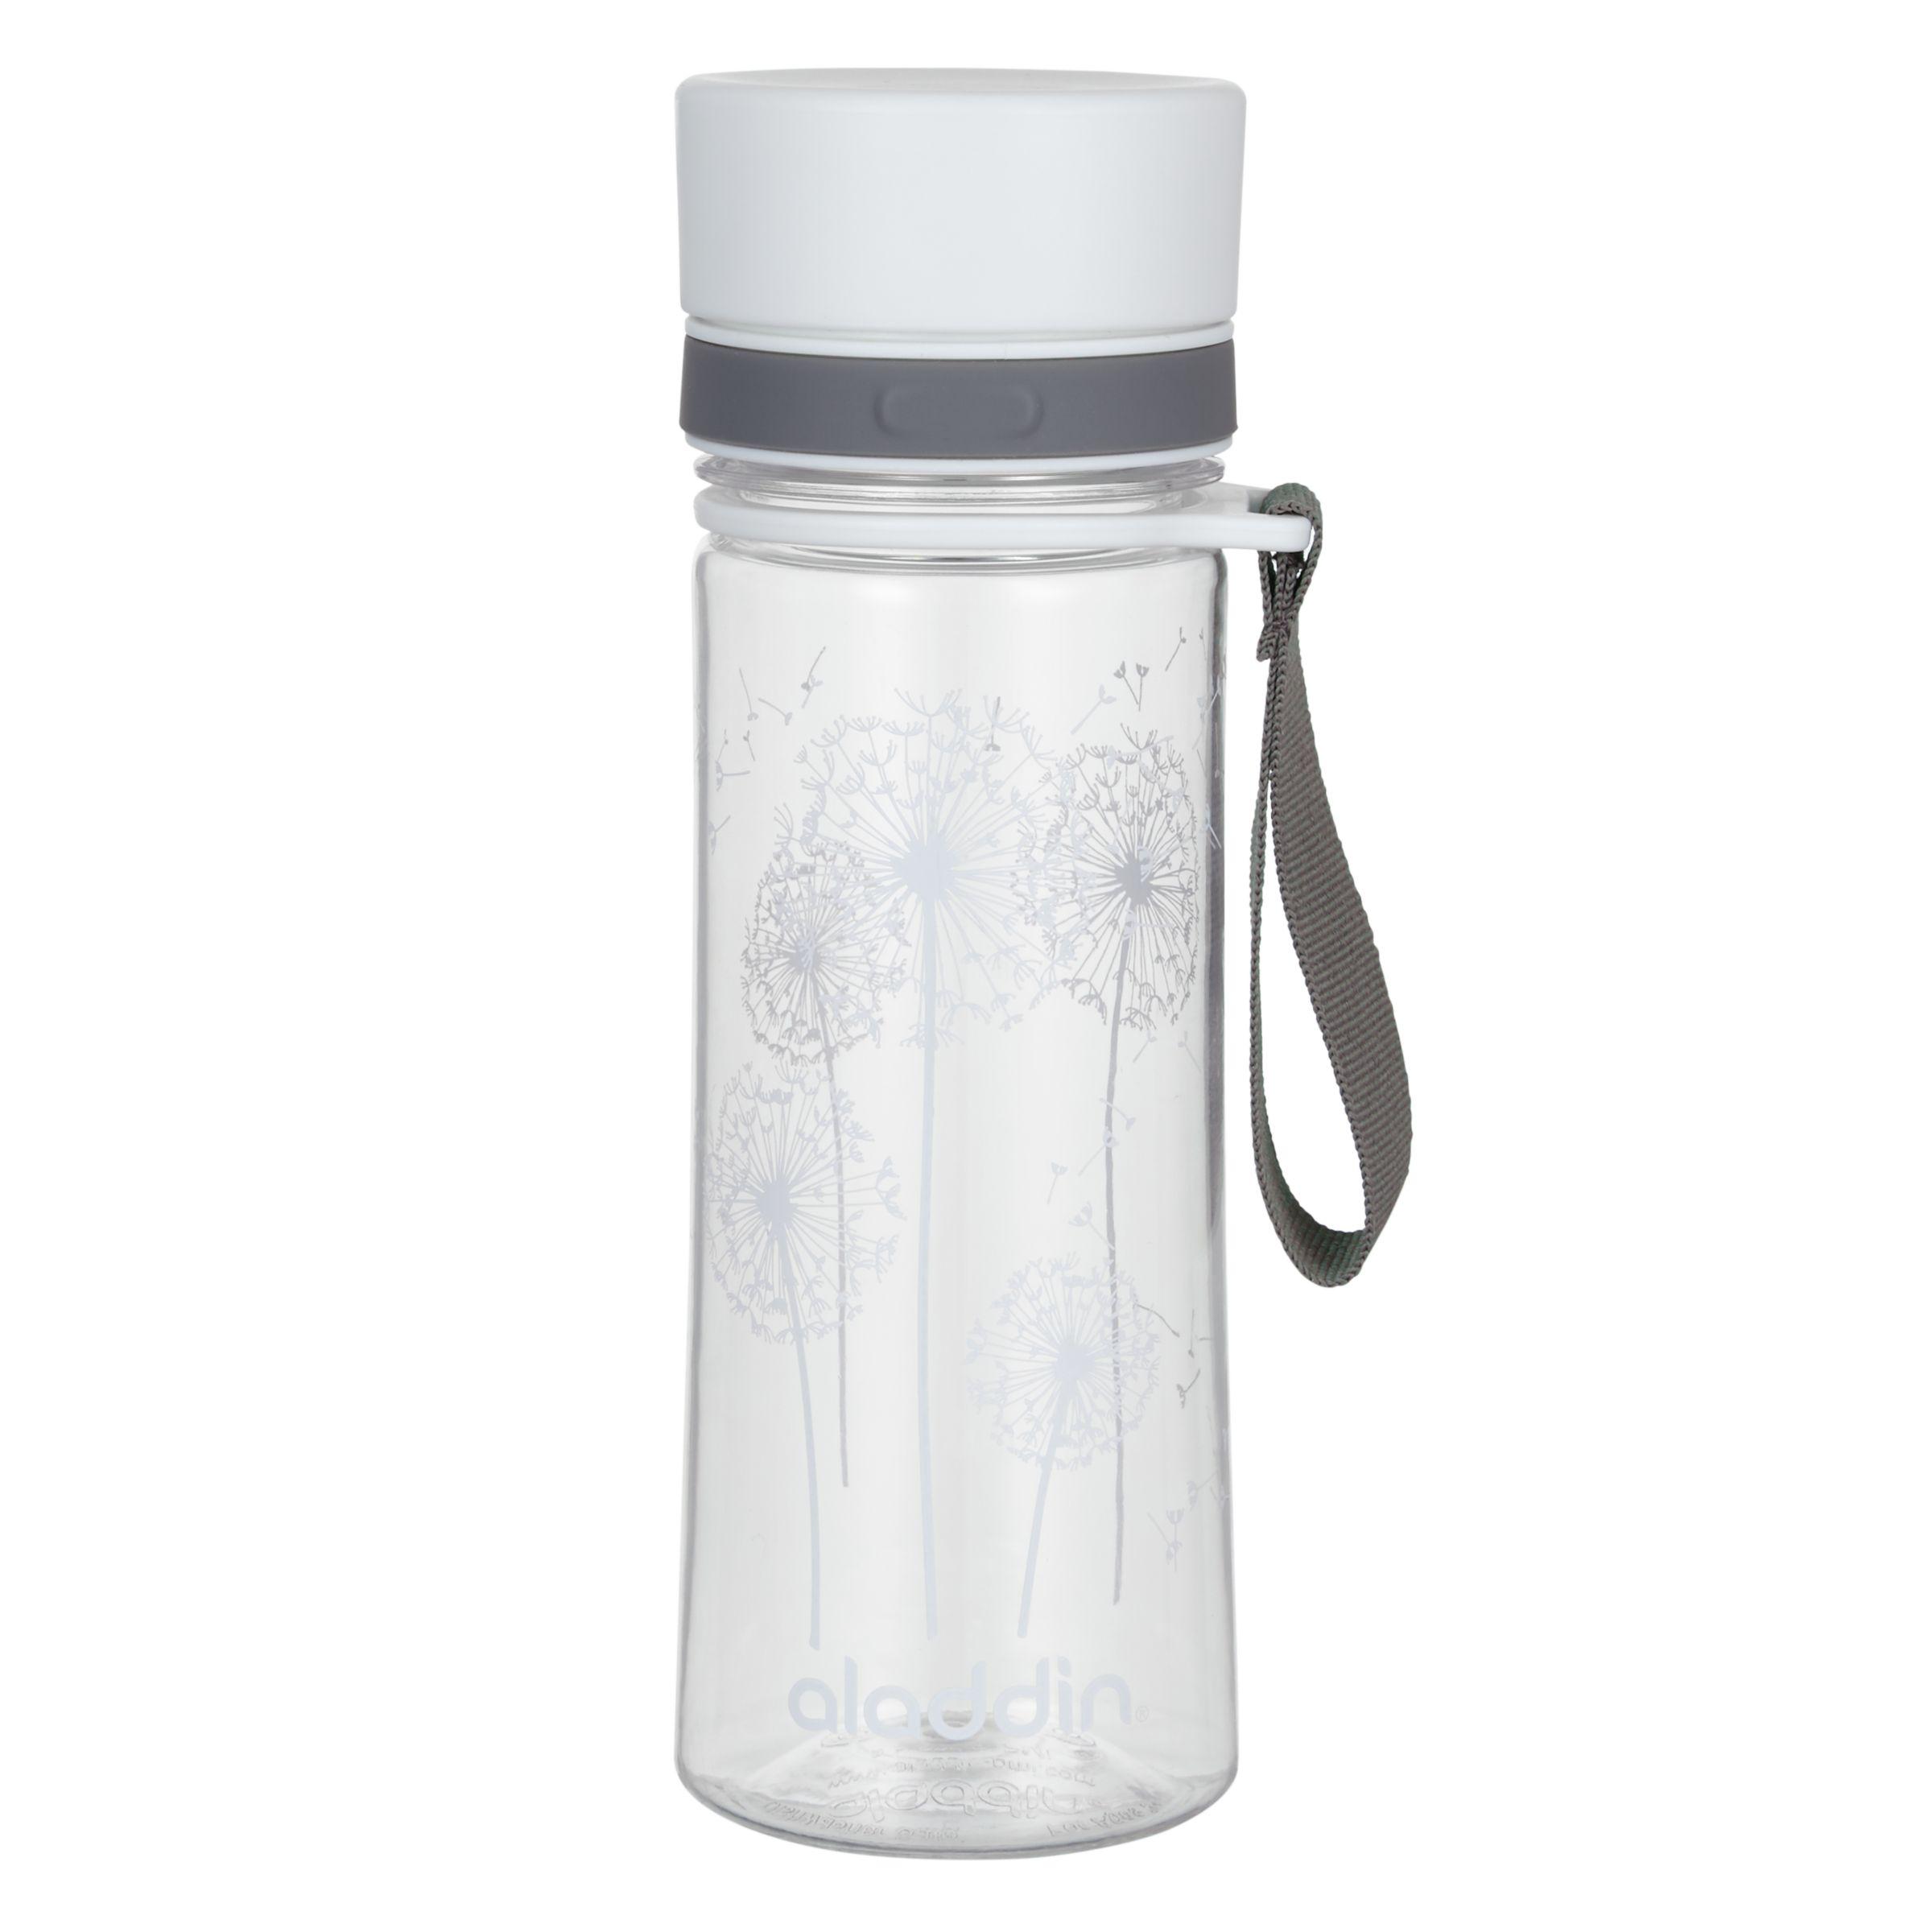 Aladdin Aladdin Aveo Water Bottle, White